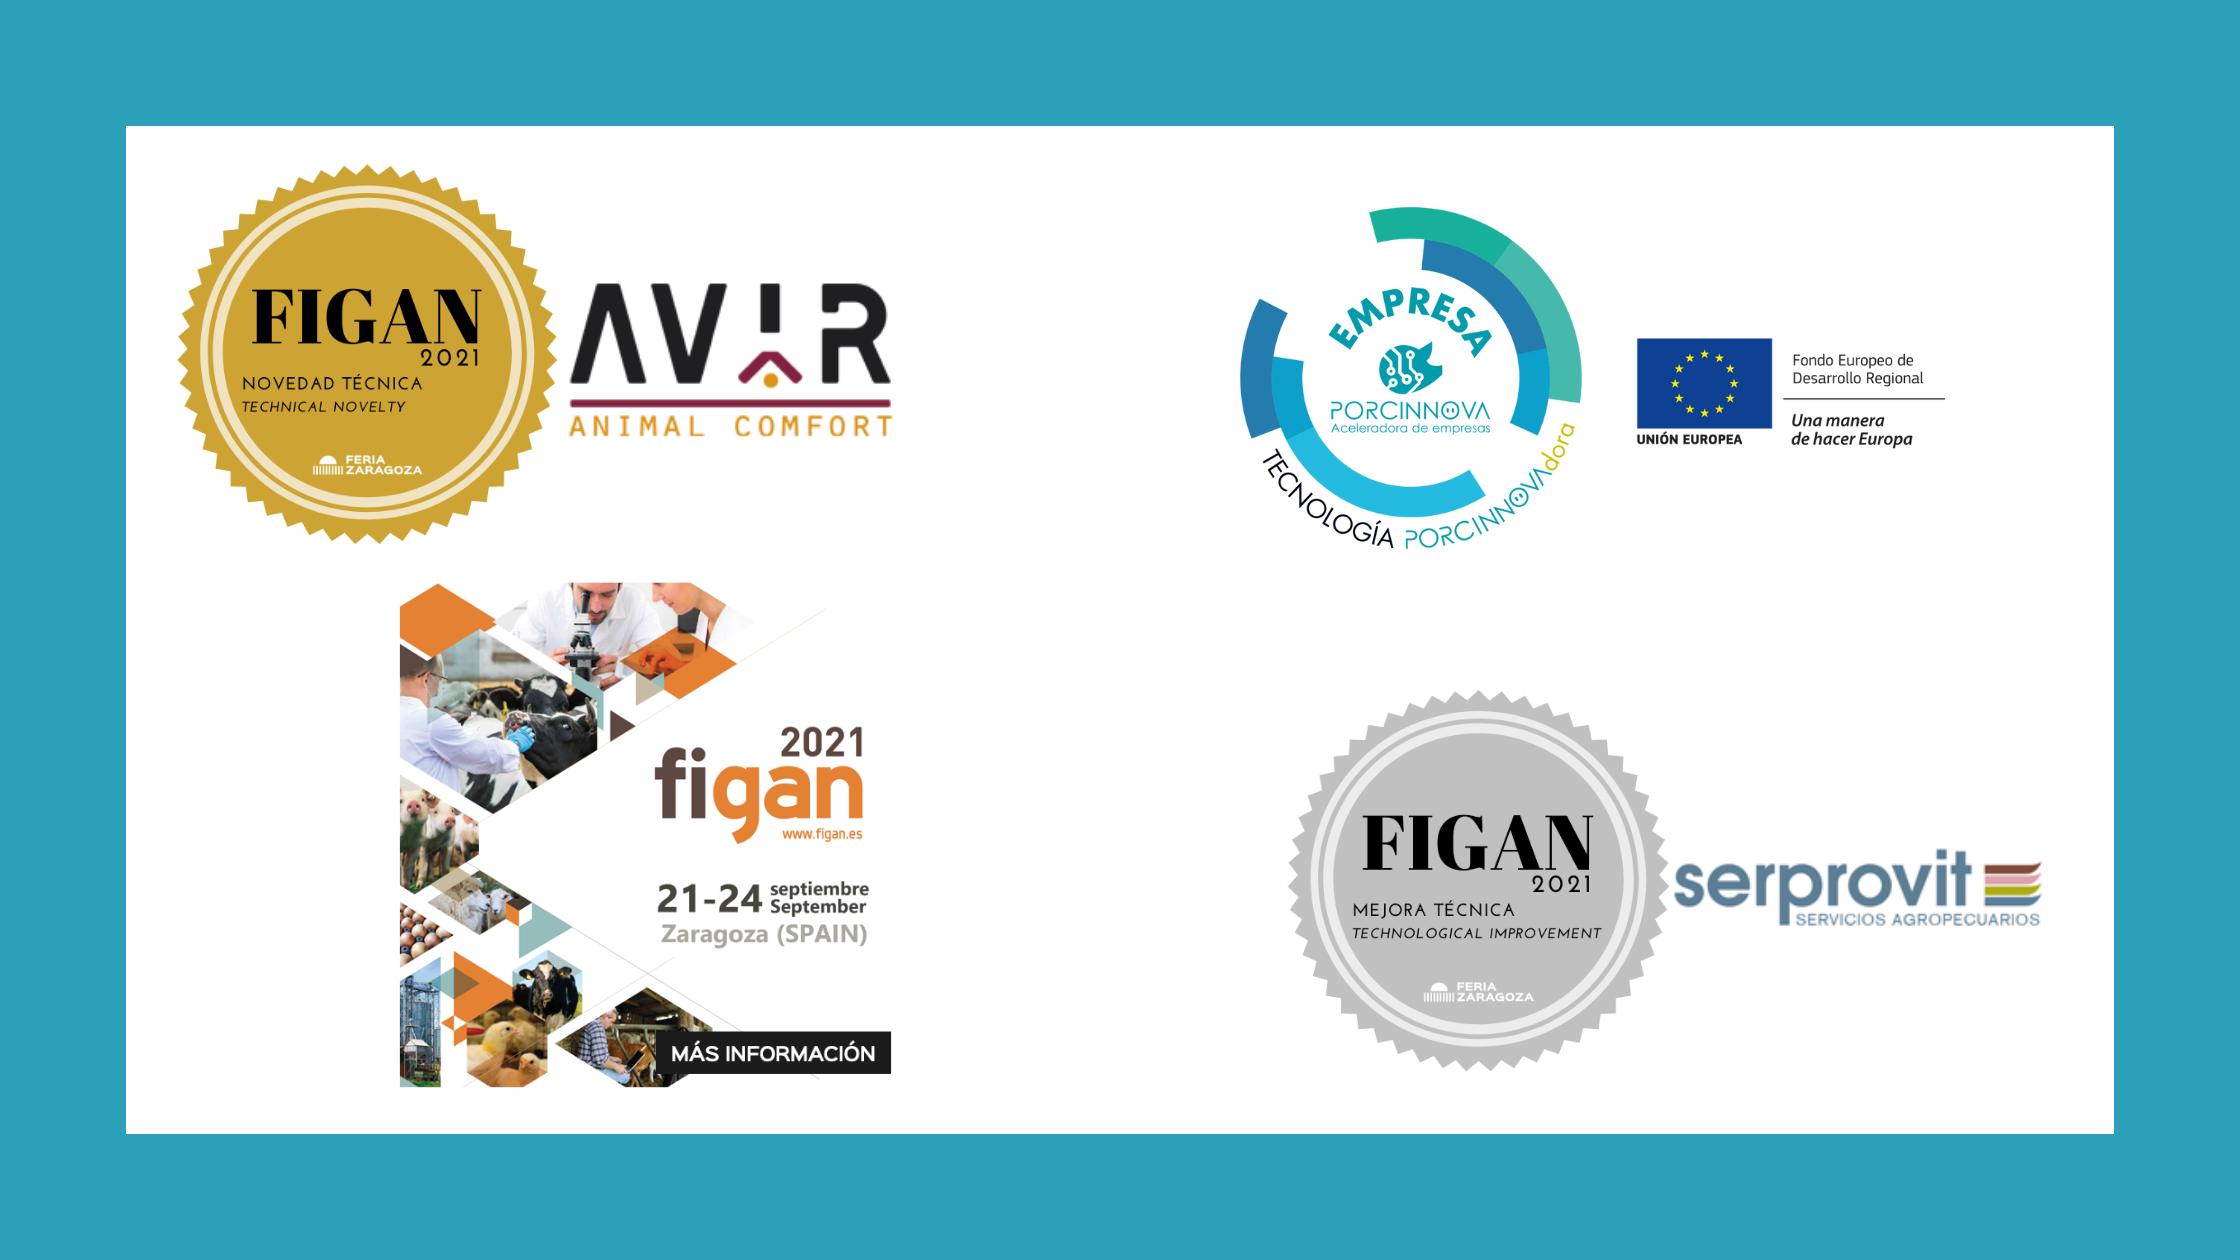 FIGAN 2021 premia a dos proyectos PORCINNOVAdores